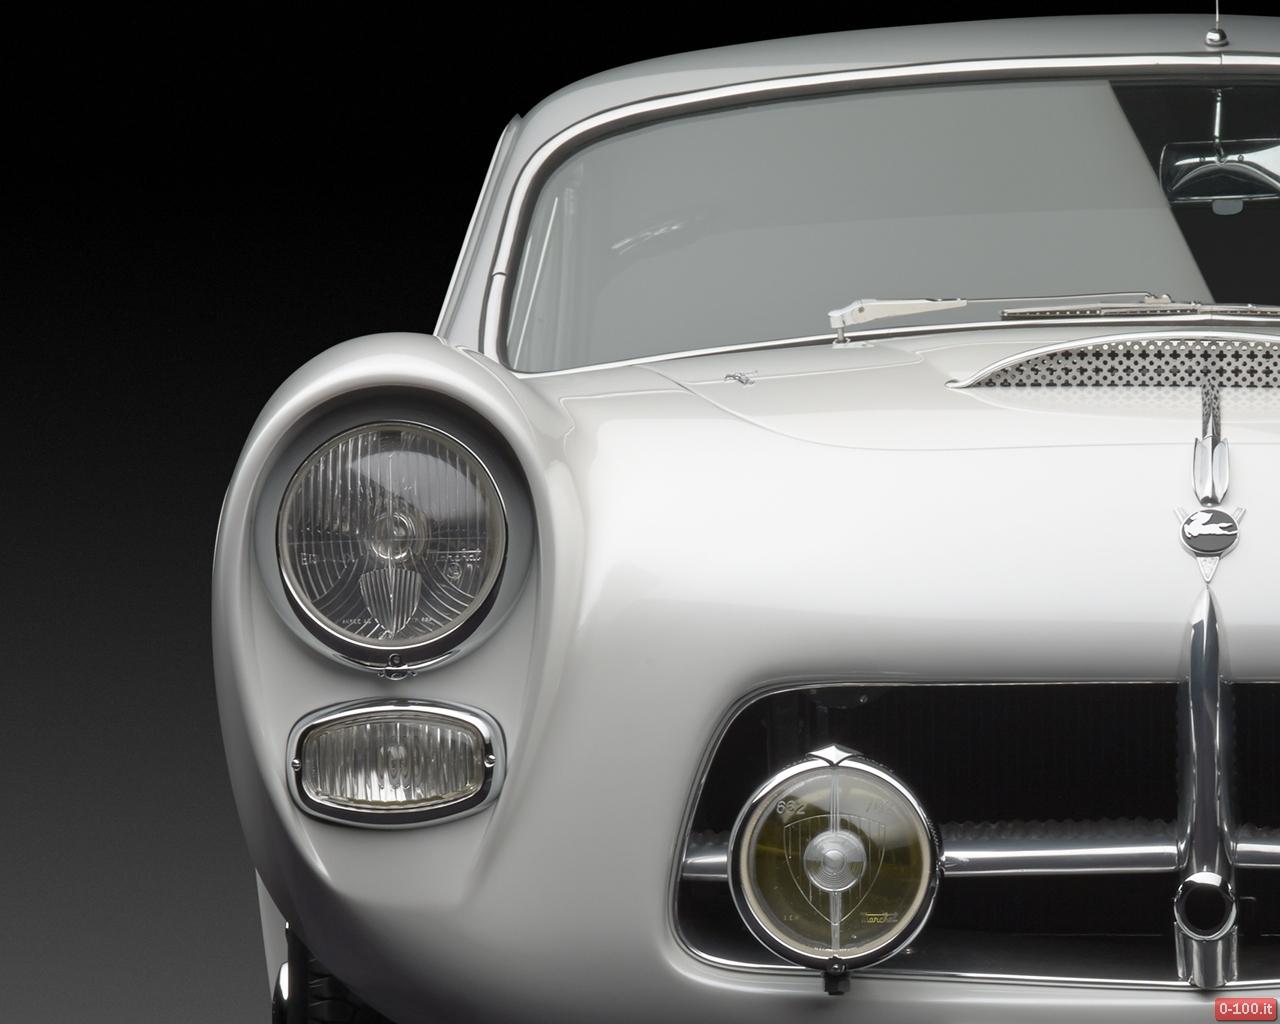 pegaso-z-102-berlinetta-serie-ii-by-carrosserie-j-saoutchik-rm-auctions_0-100_7